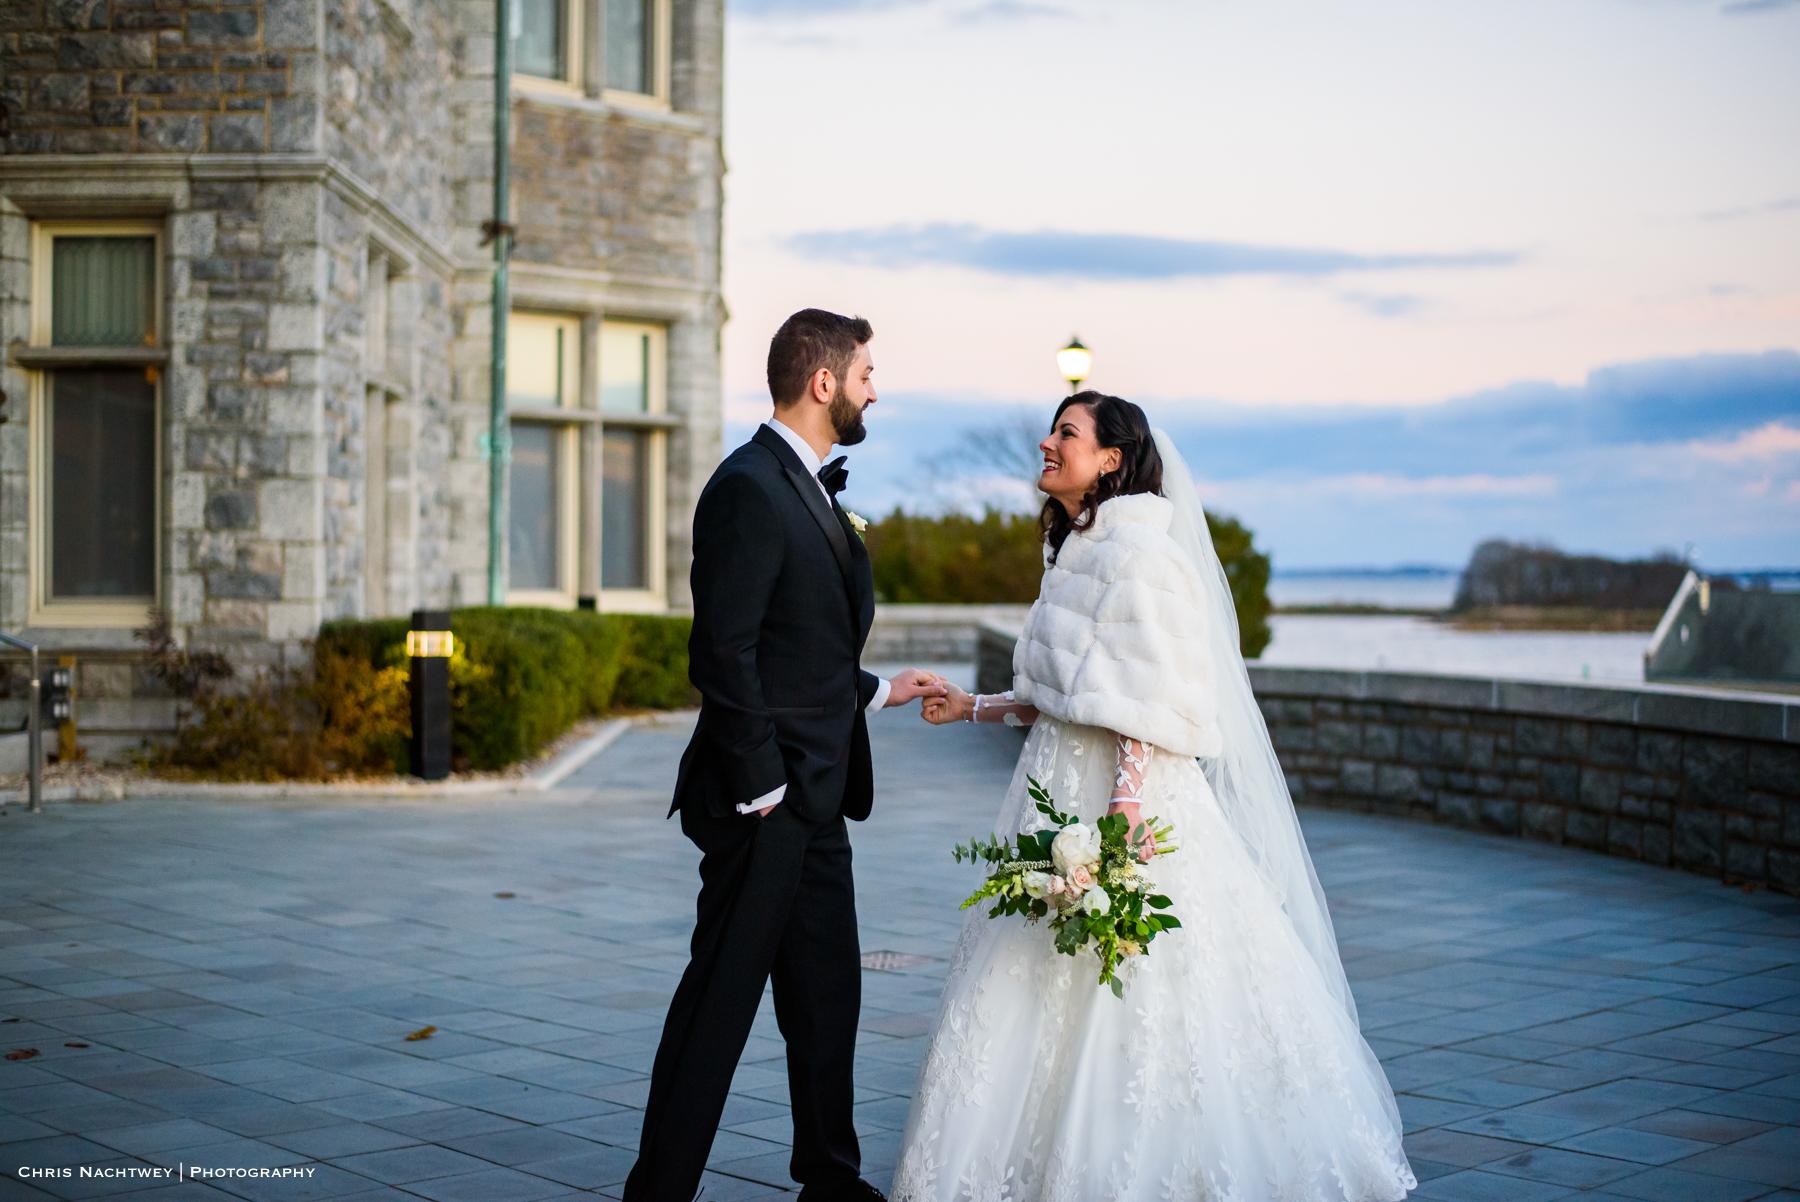 winter-branford-house-wedding-photos-groton-ct-chris-nachtwey-photography-2019-28.jpg